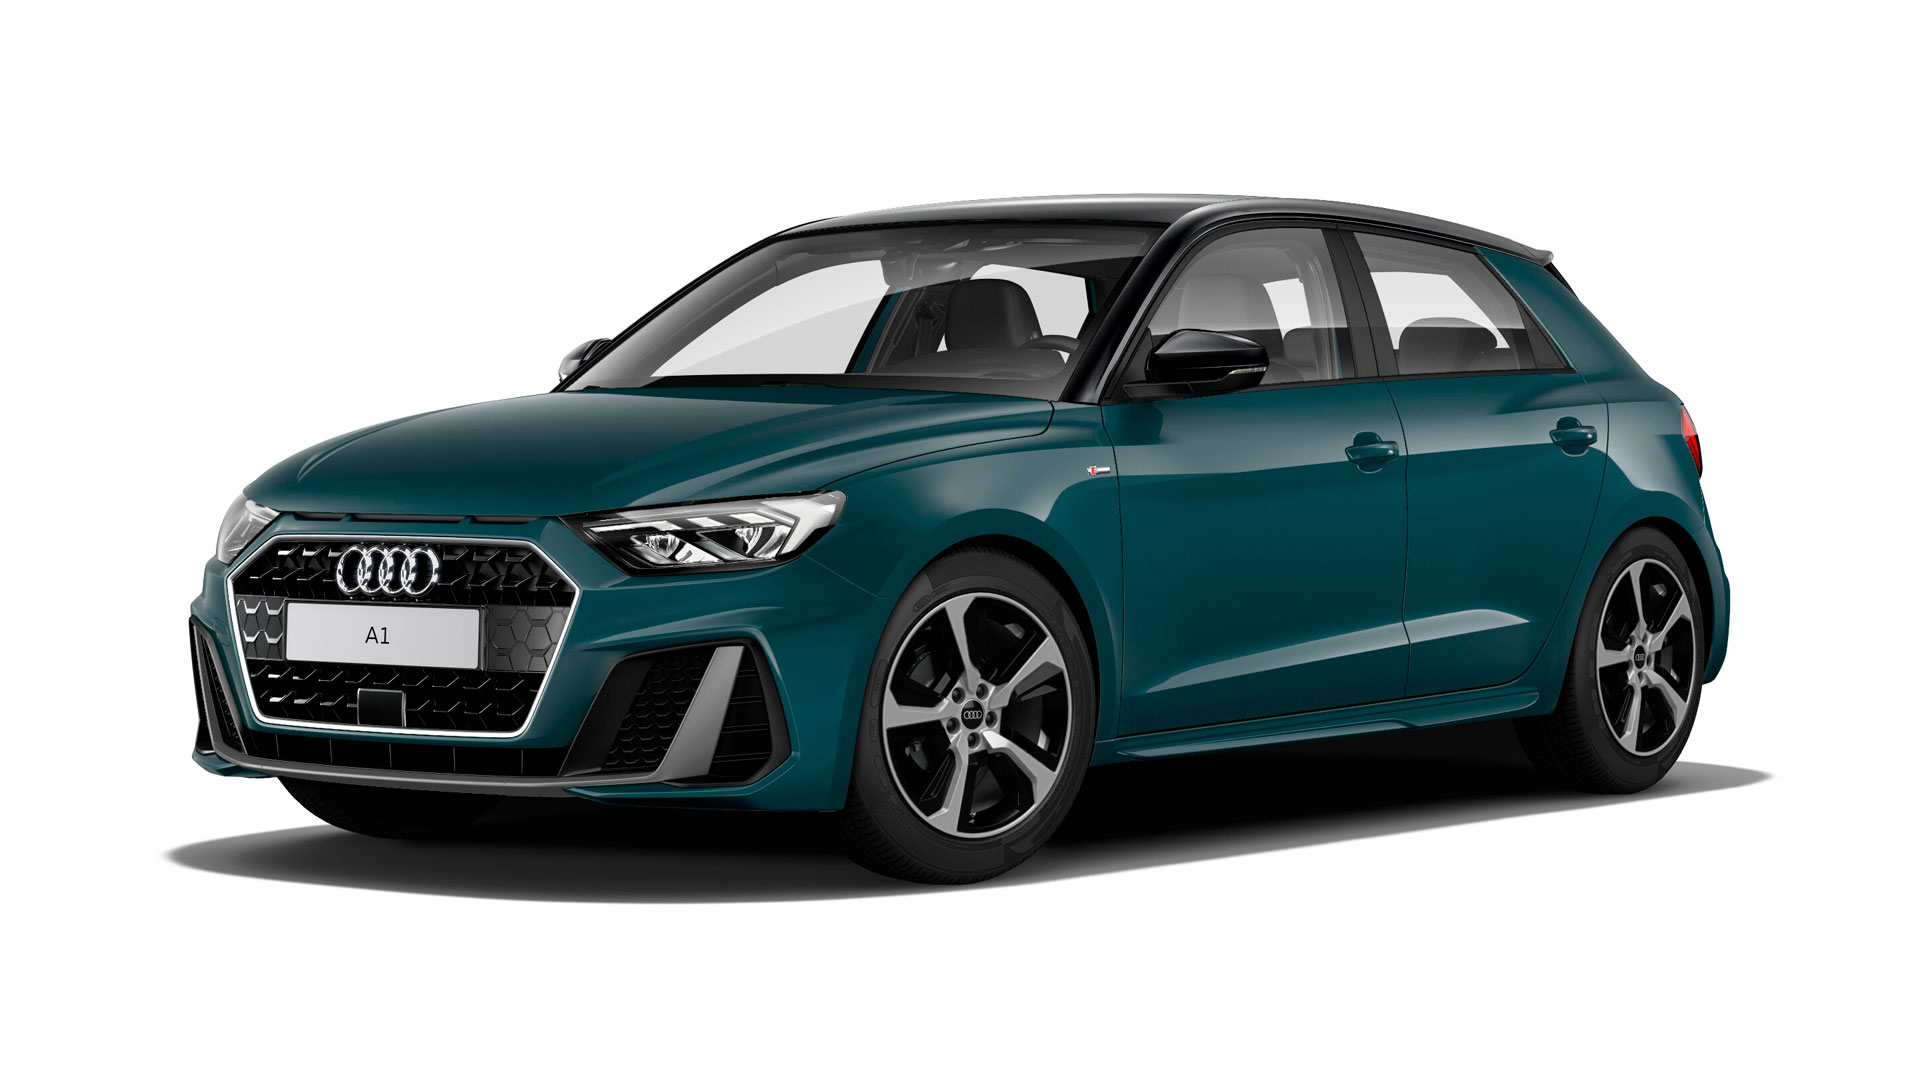 Audi-A1-Adrenalin